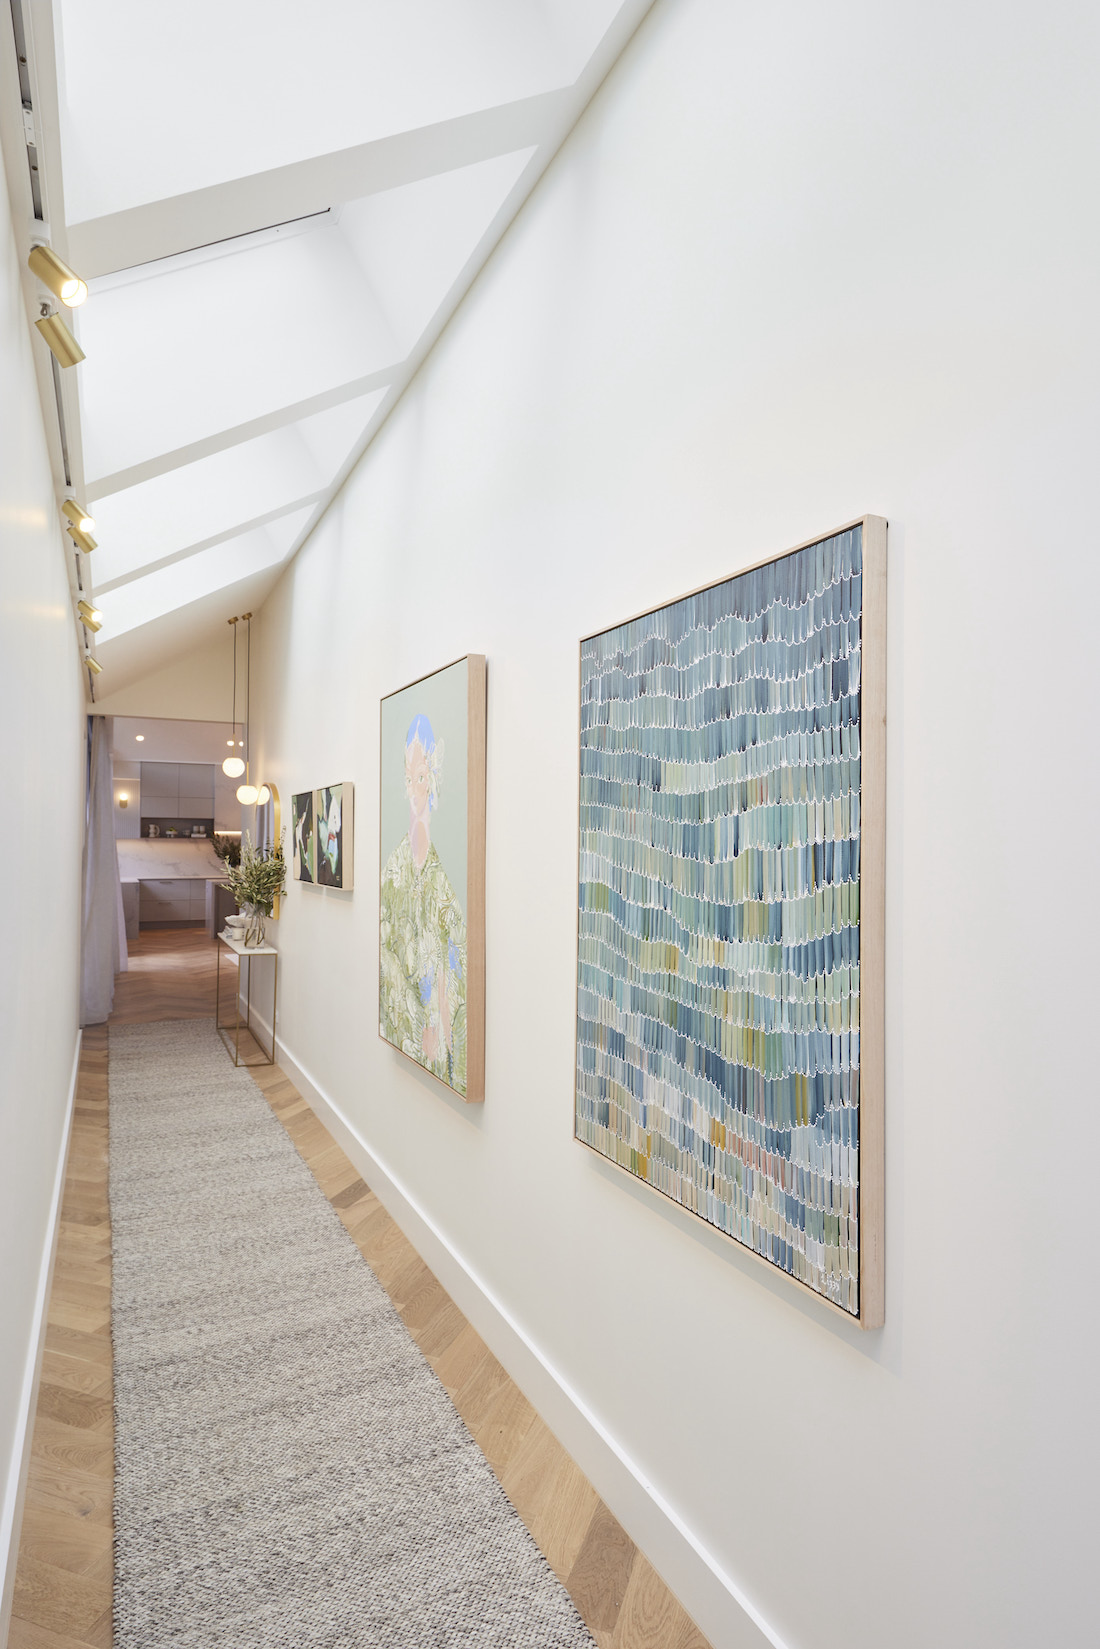 Skylight hallway with artwork